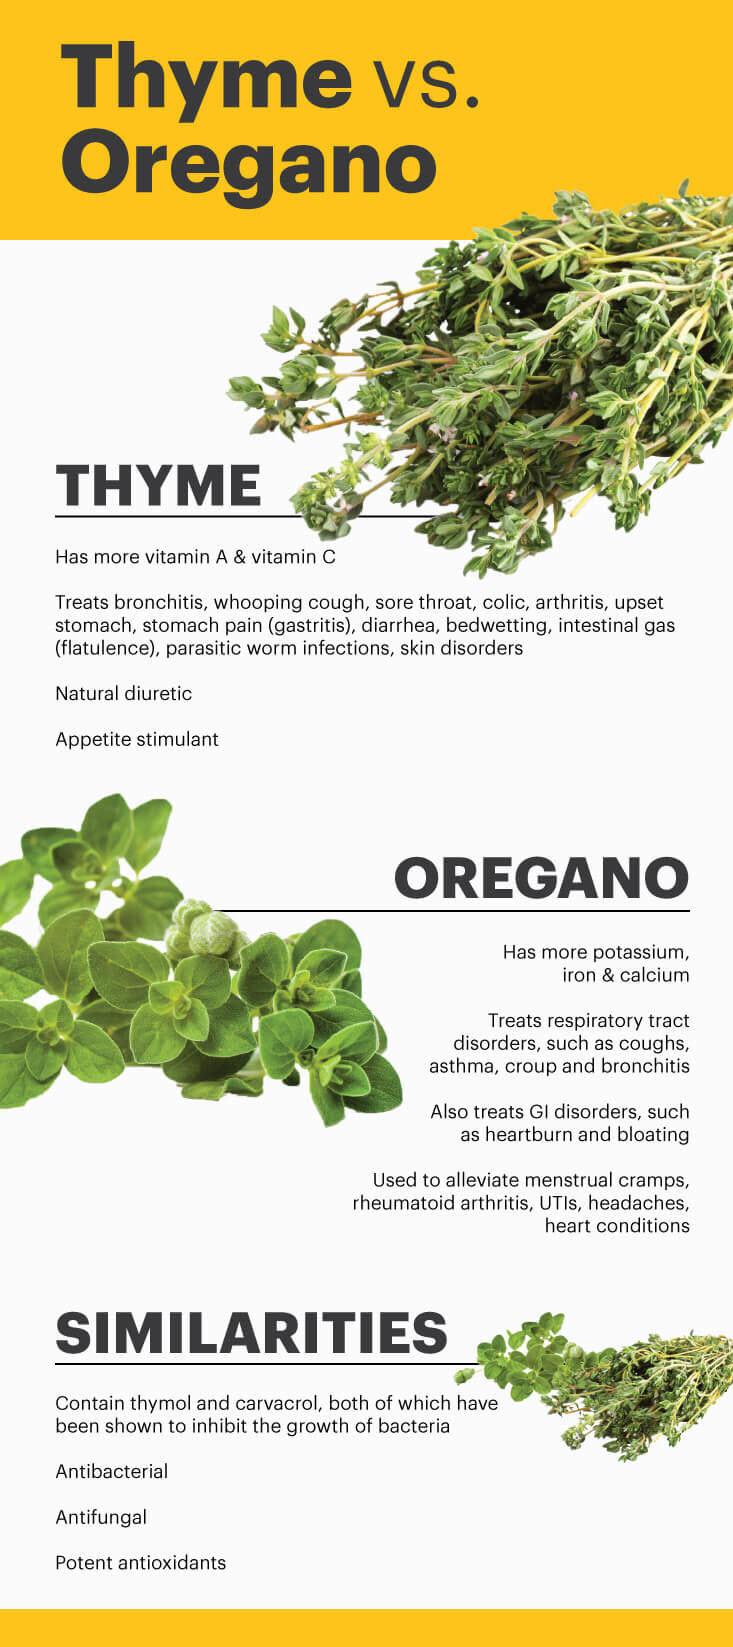 Thyme vs. oregano